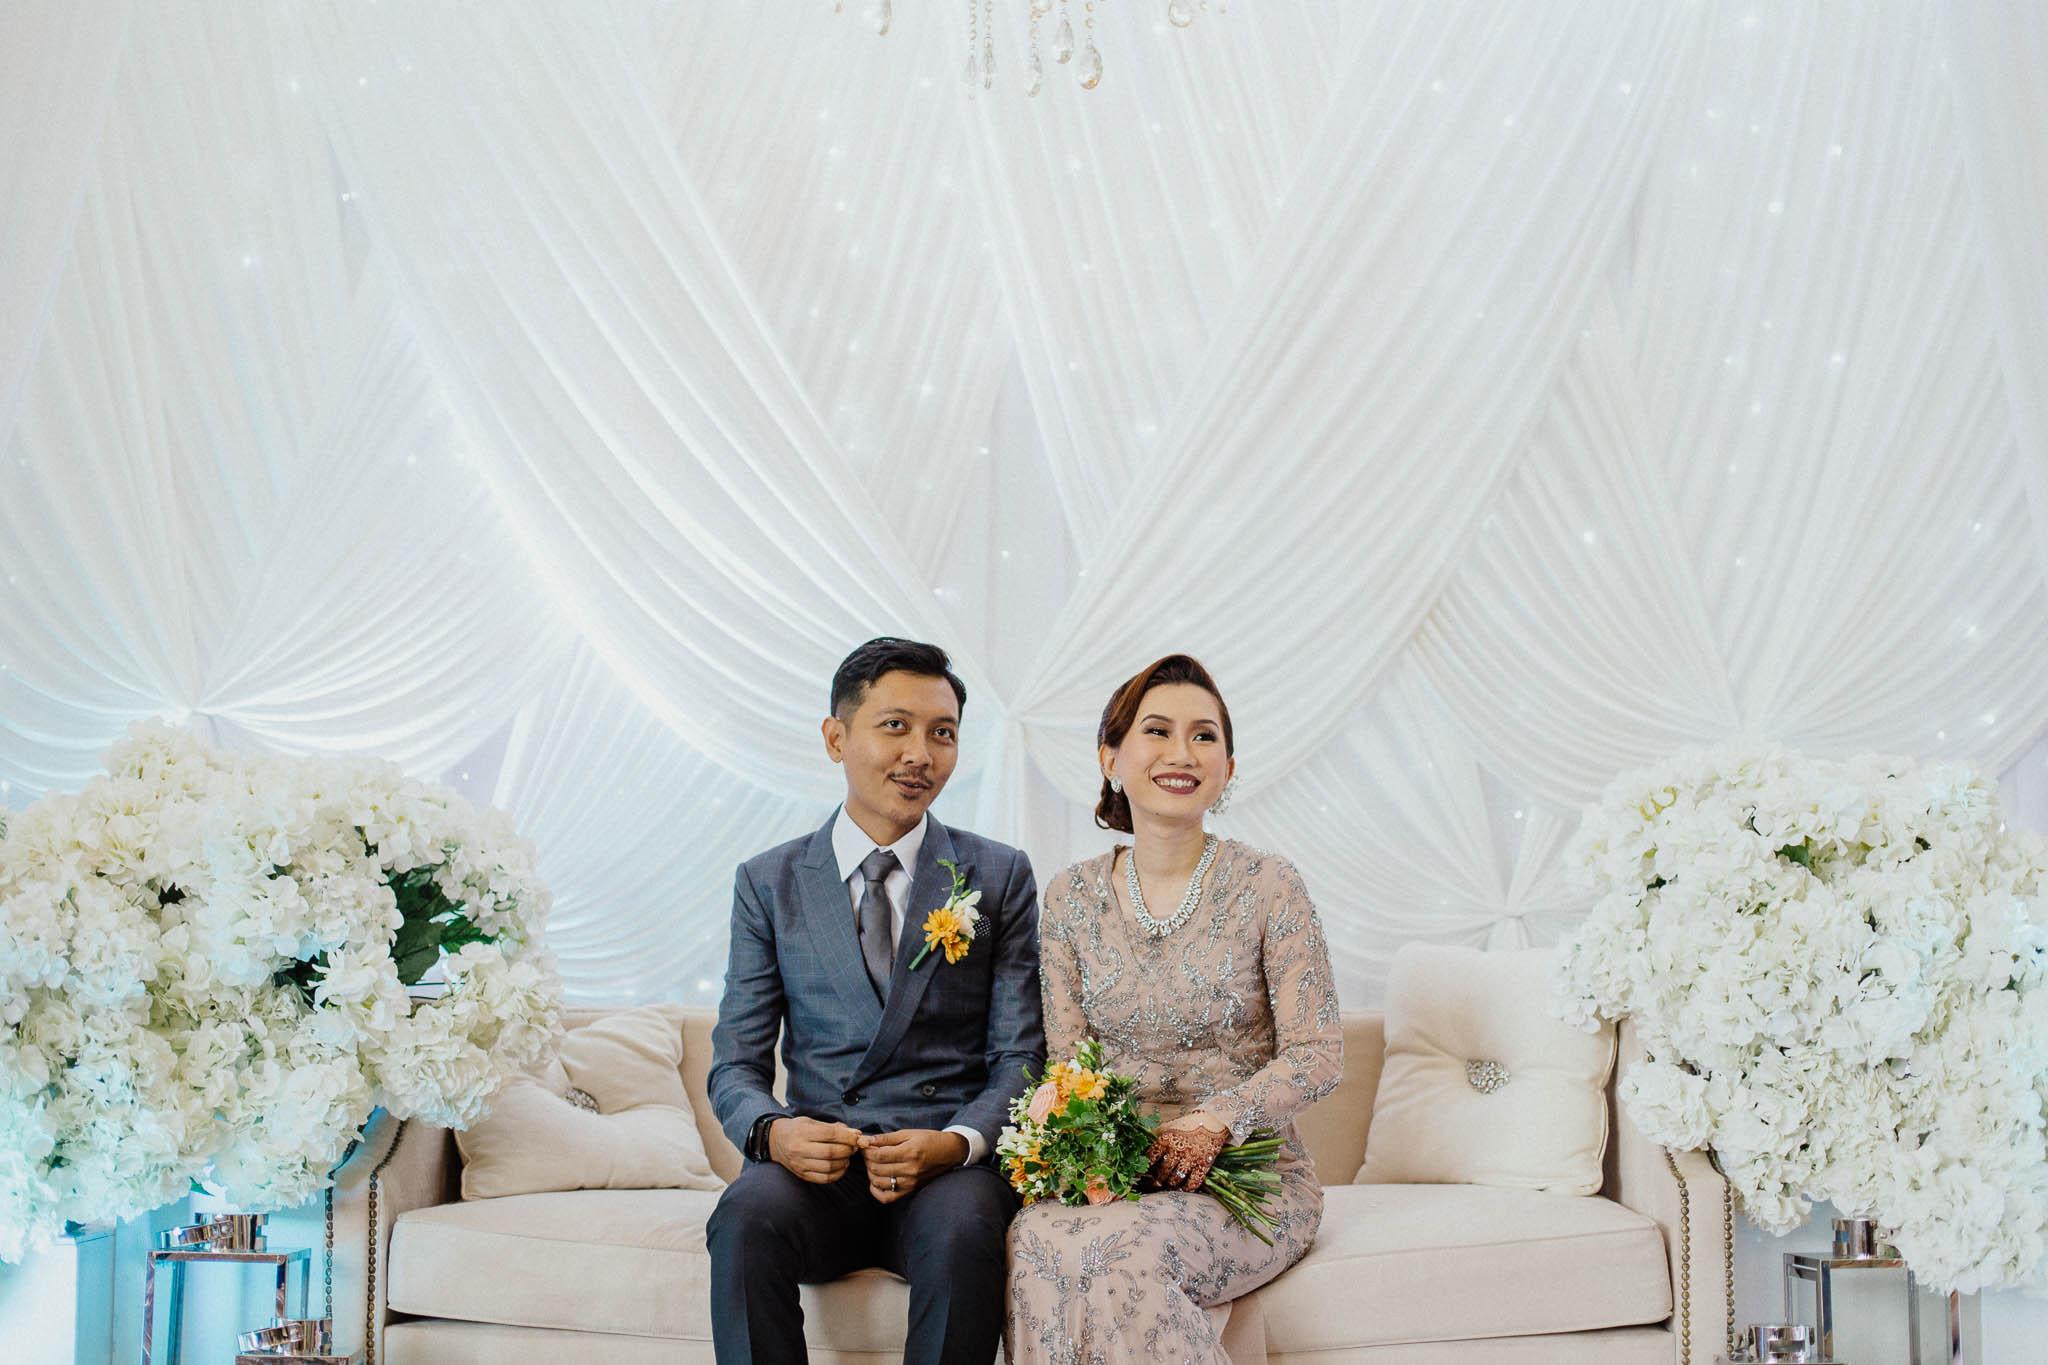 singapore-wedding-photographer-addafiq-nufail-059.jpg